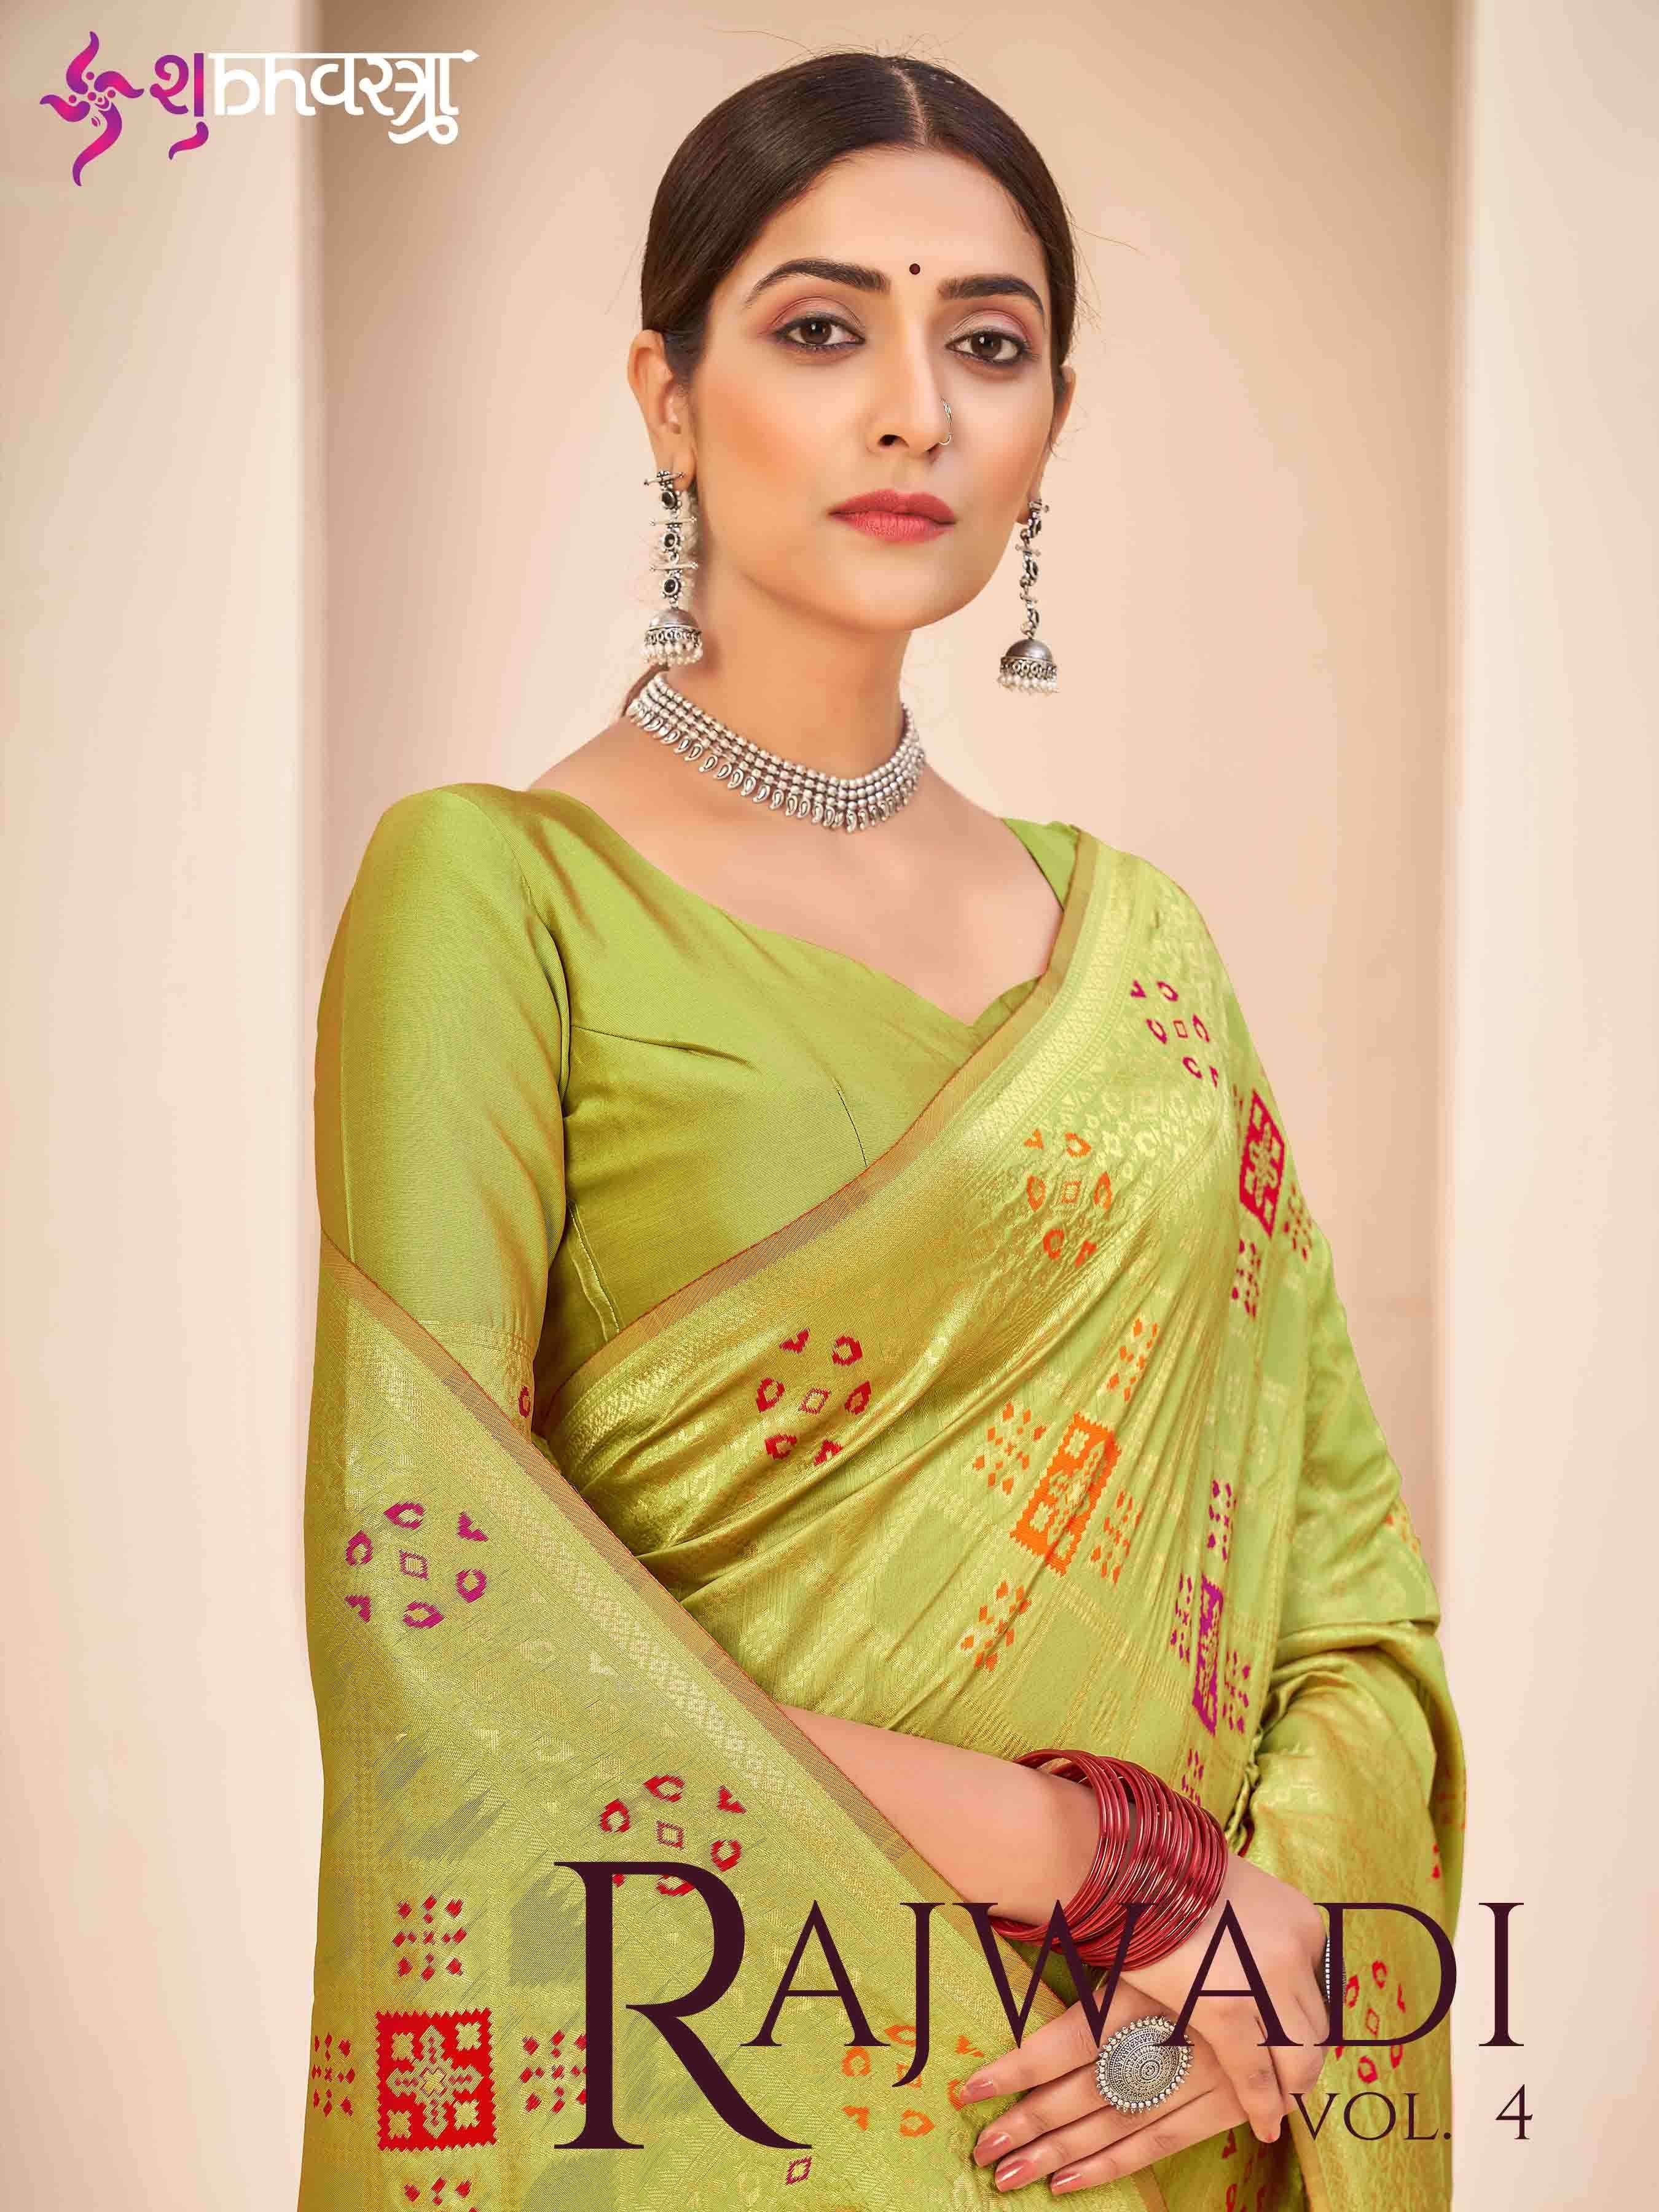 Shubhkala By Rajwadi Vol. 4 Designer Exclusive Banarasi Silk Saree Collection